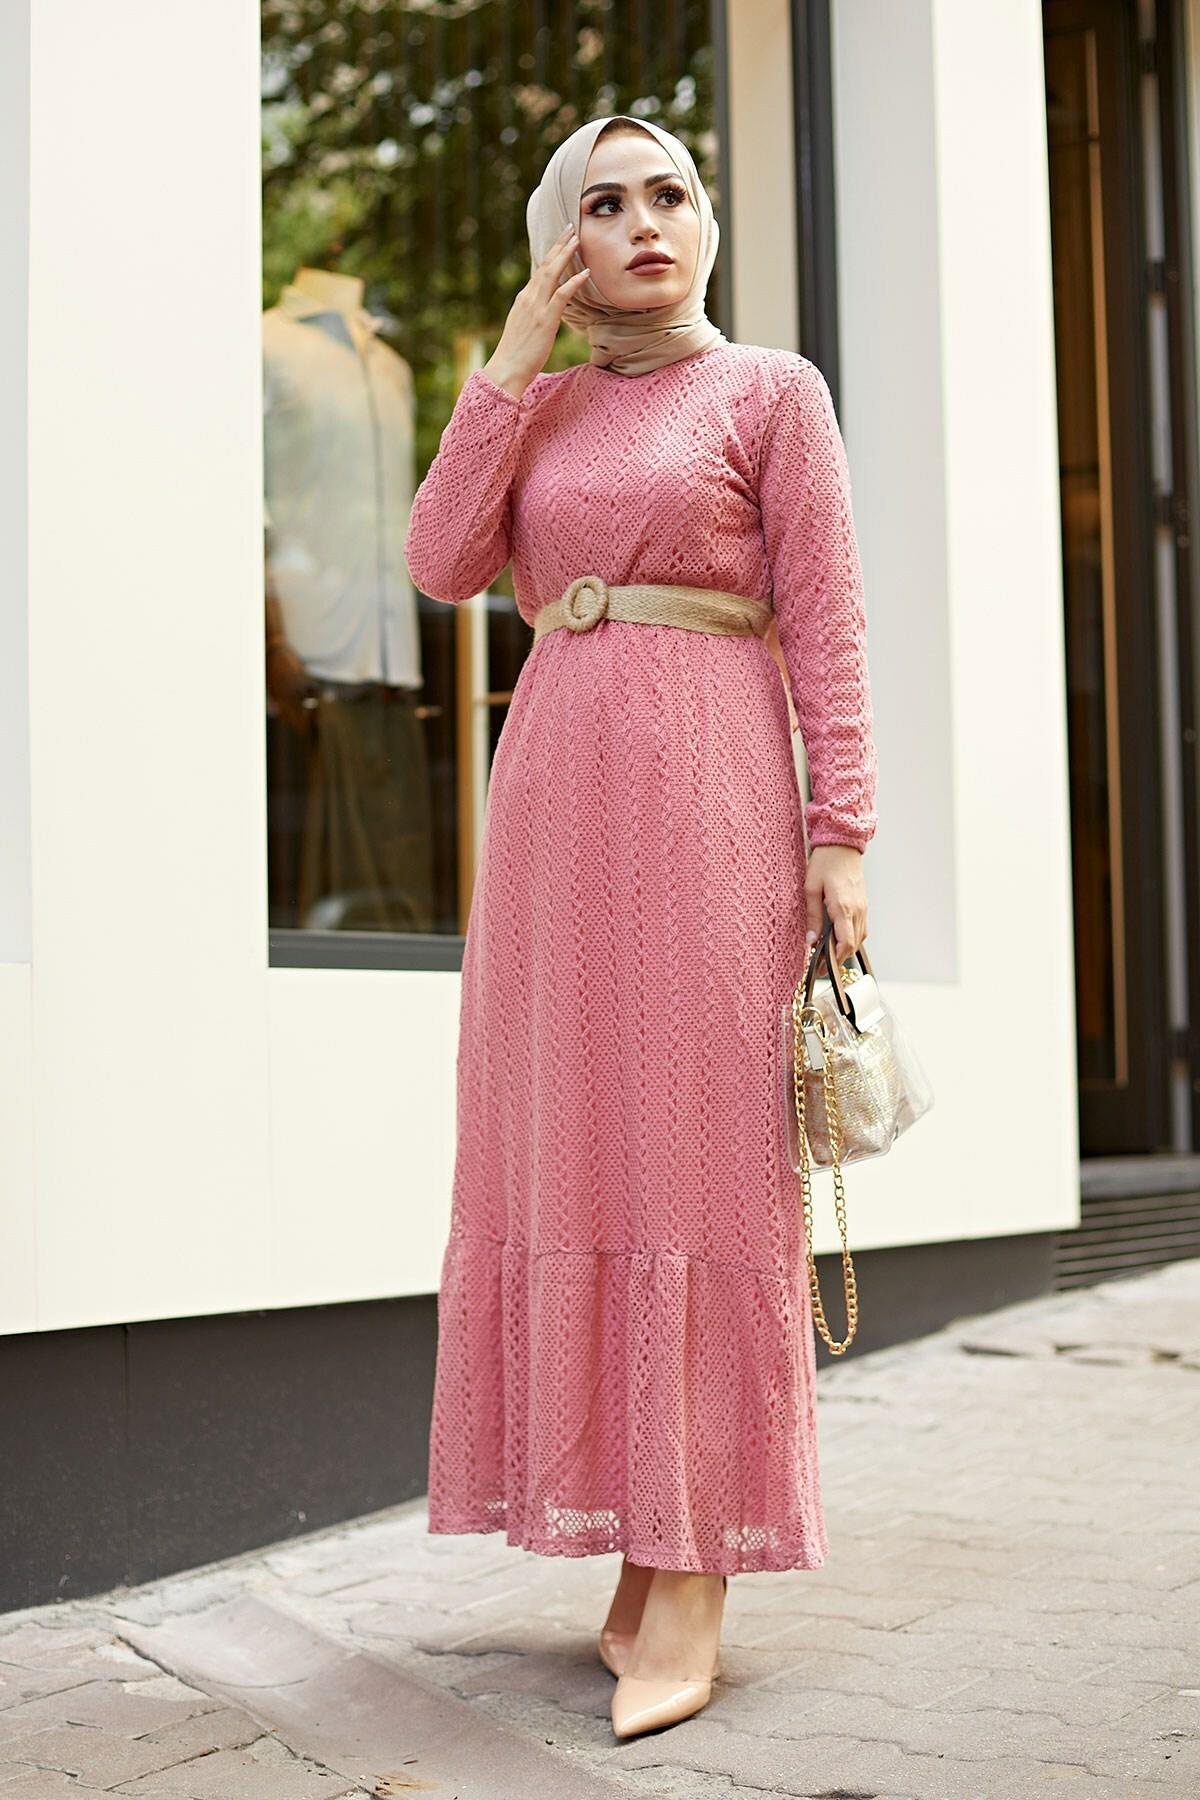 Women Long Dress Turkish Made Fast Shipping Arabic Abaya Hijab Clothes Fashion Style Autumn Elegant Design Lace for Style Women